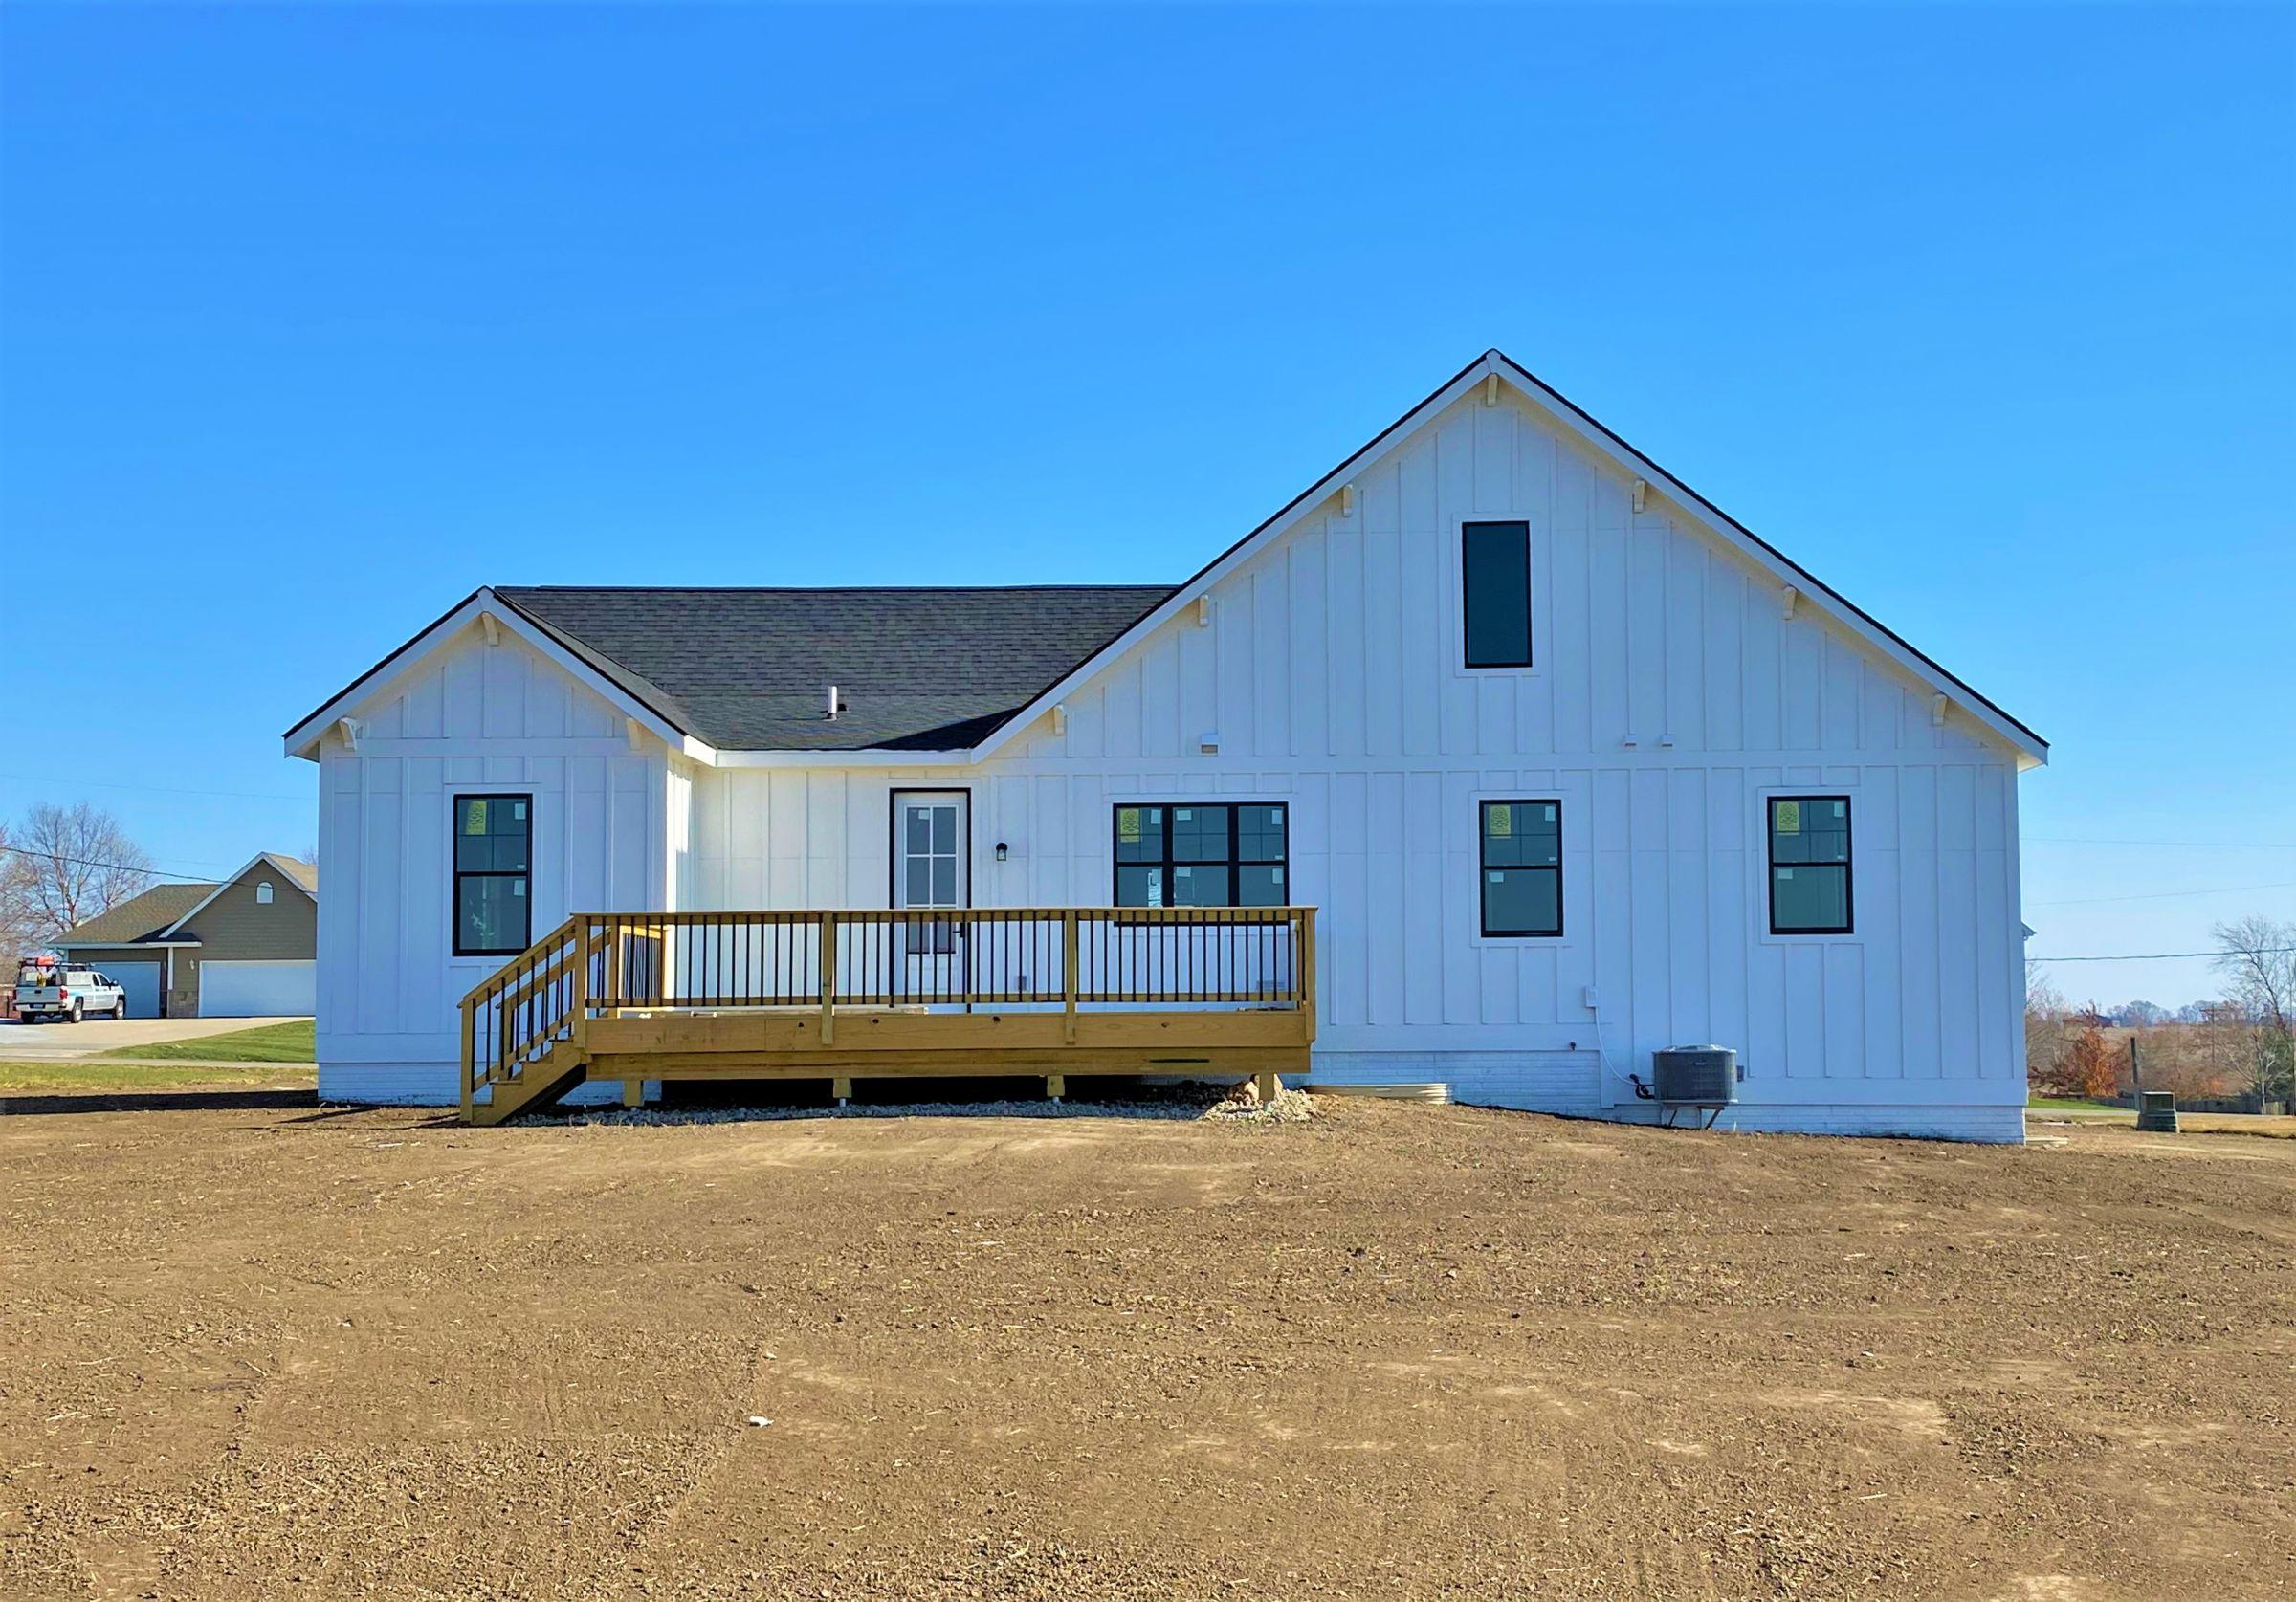 residential-warren-county-iowa-1-acres-listing-number-15096-1-2020-11-12-213552.jpg